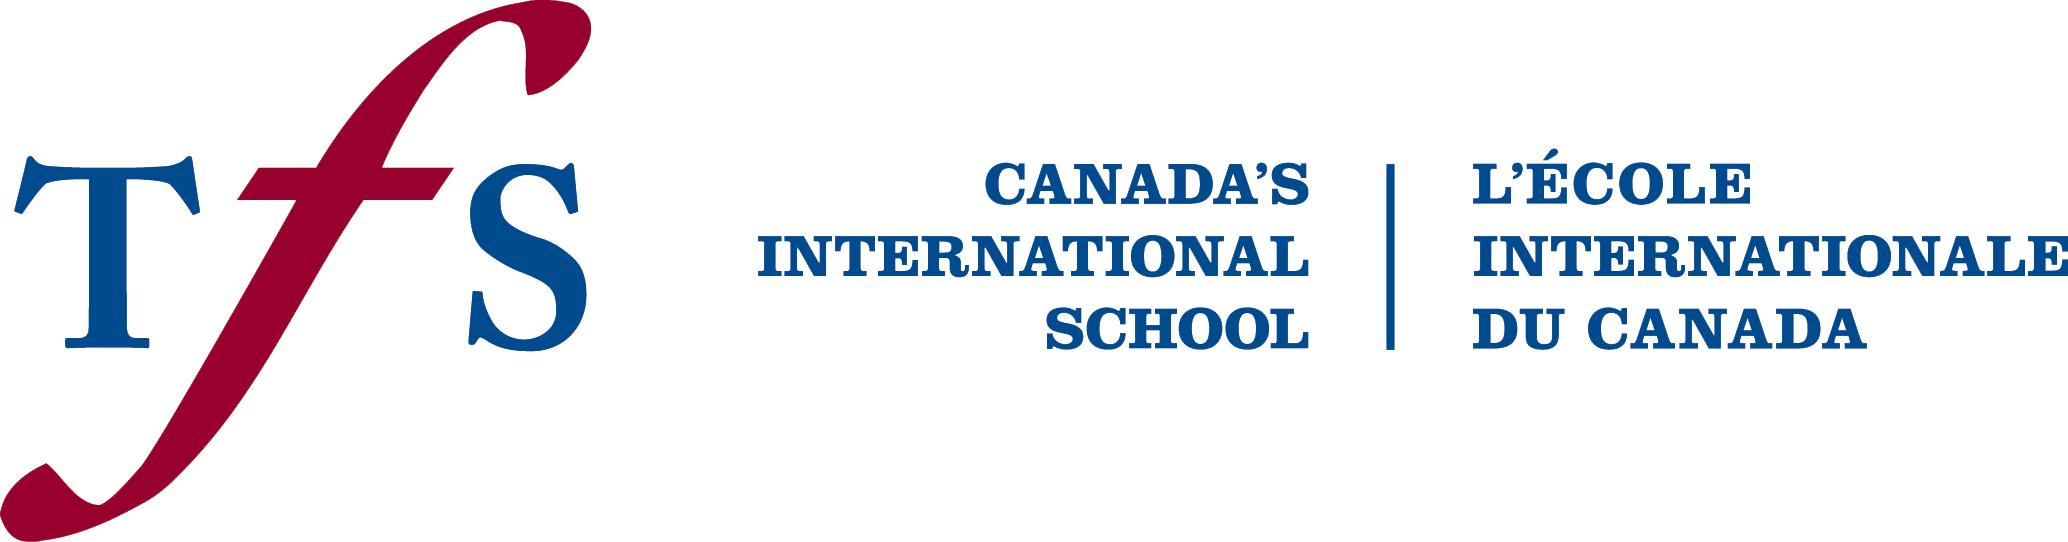 TFS Canada's International School Logo.png